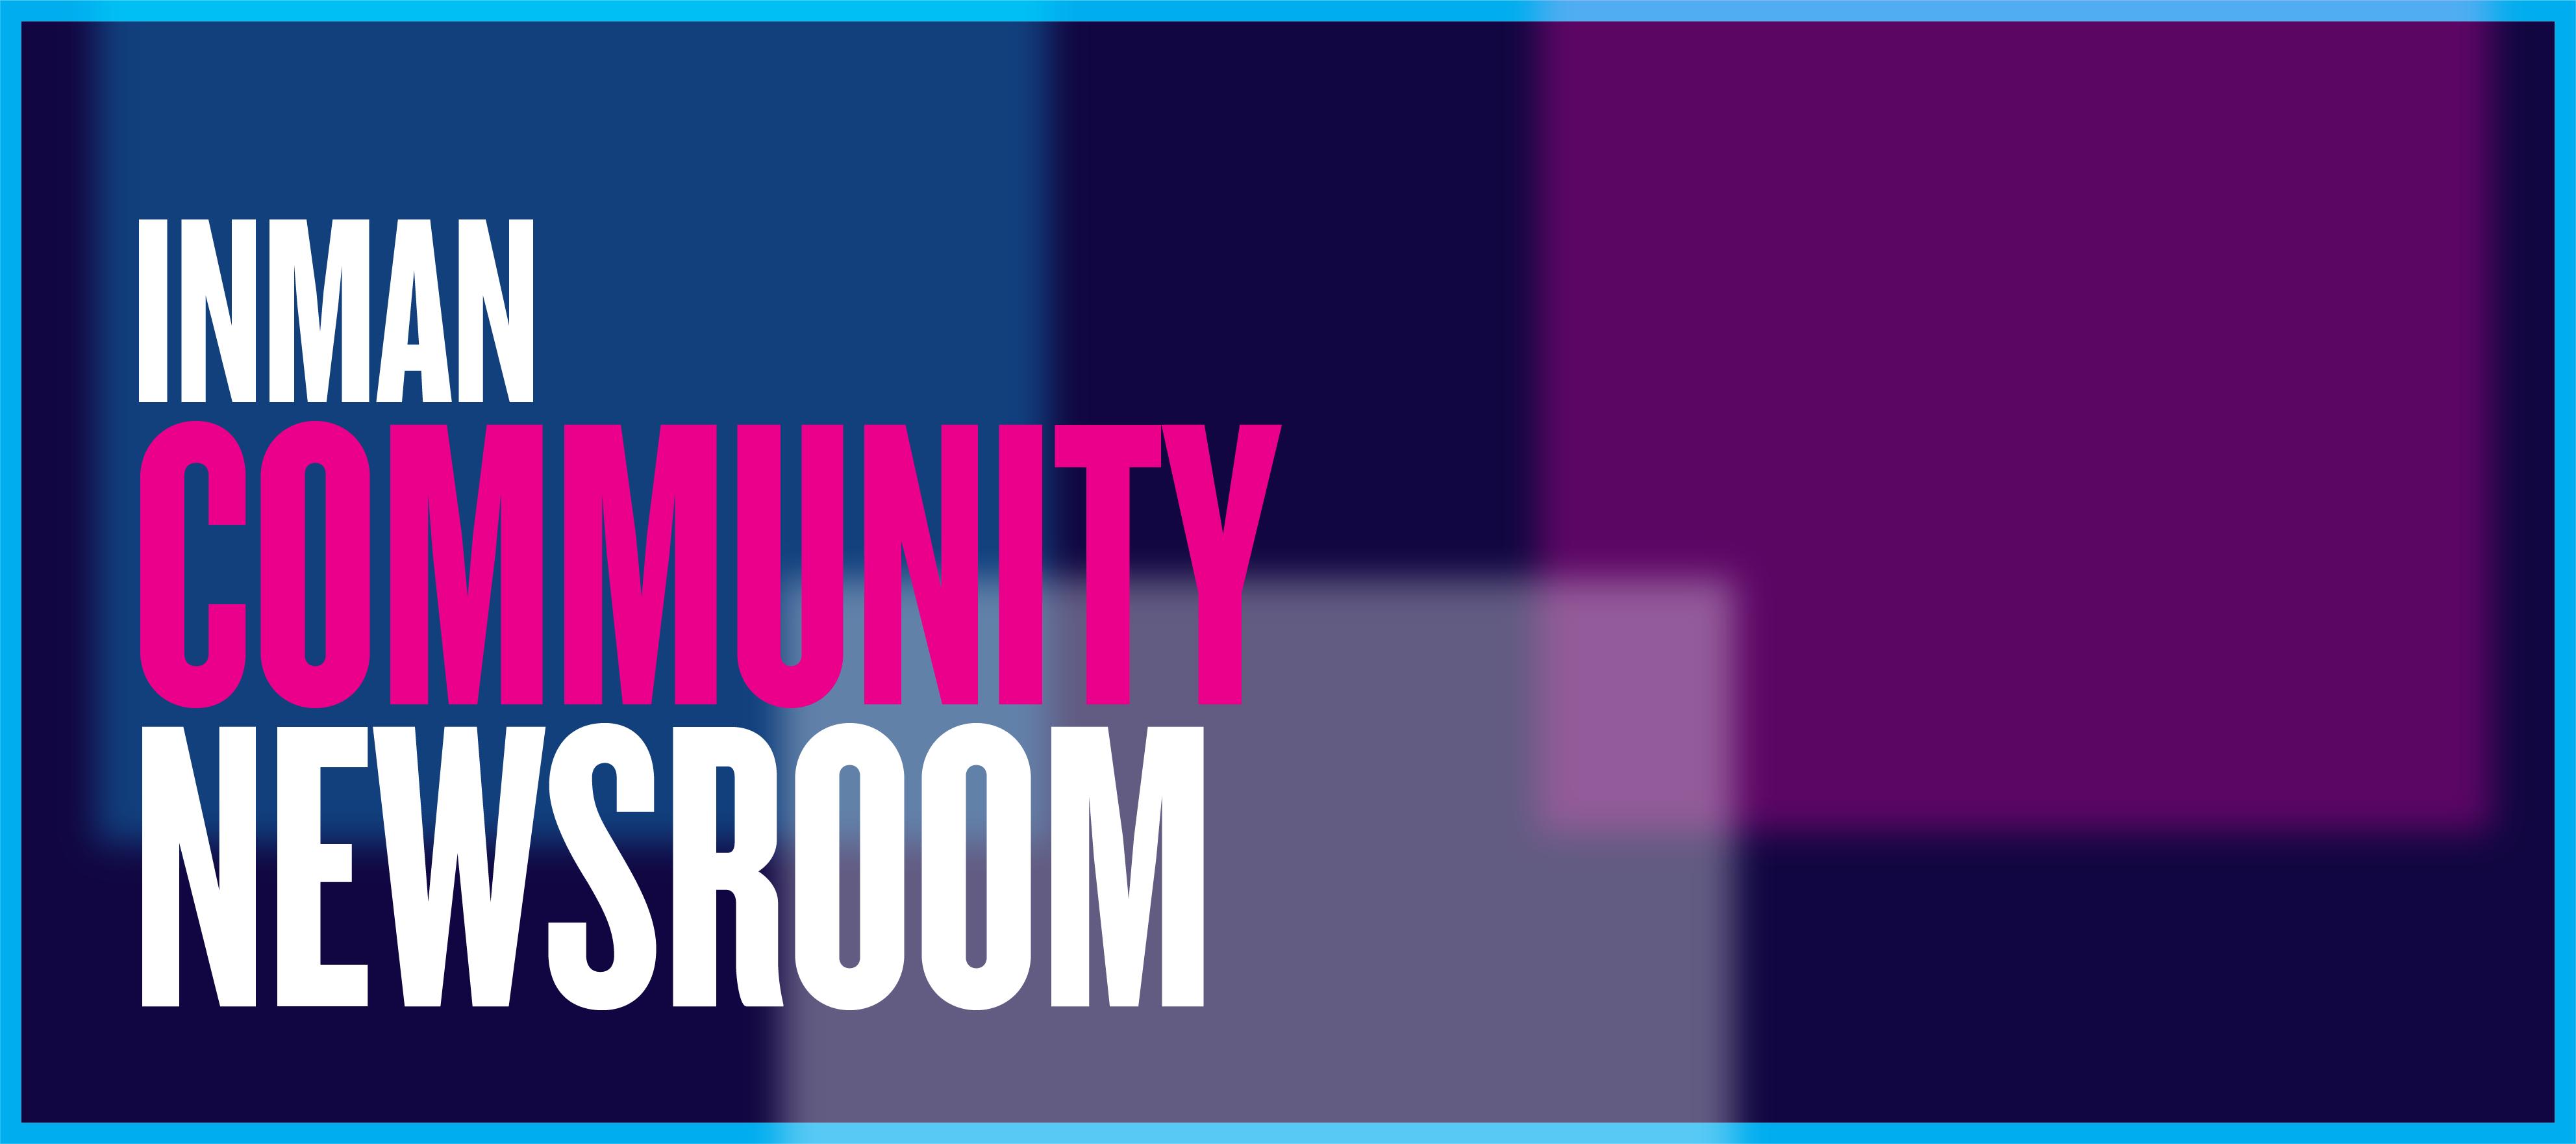 Live this week: the Inman Community Newsroom